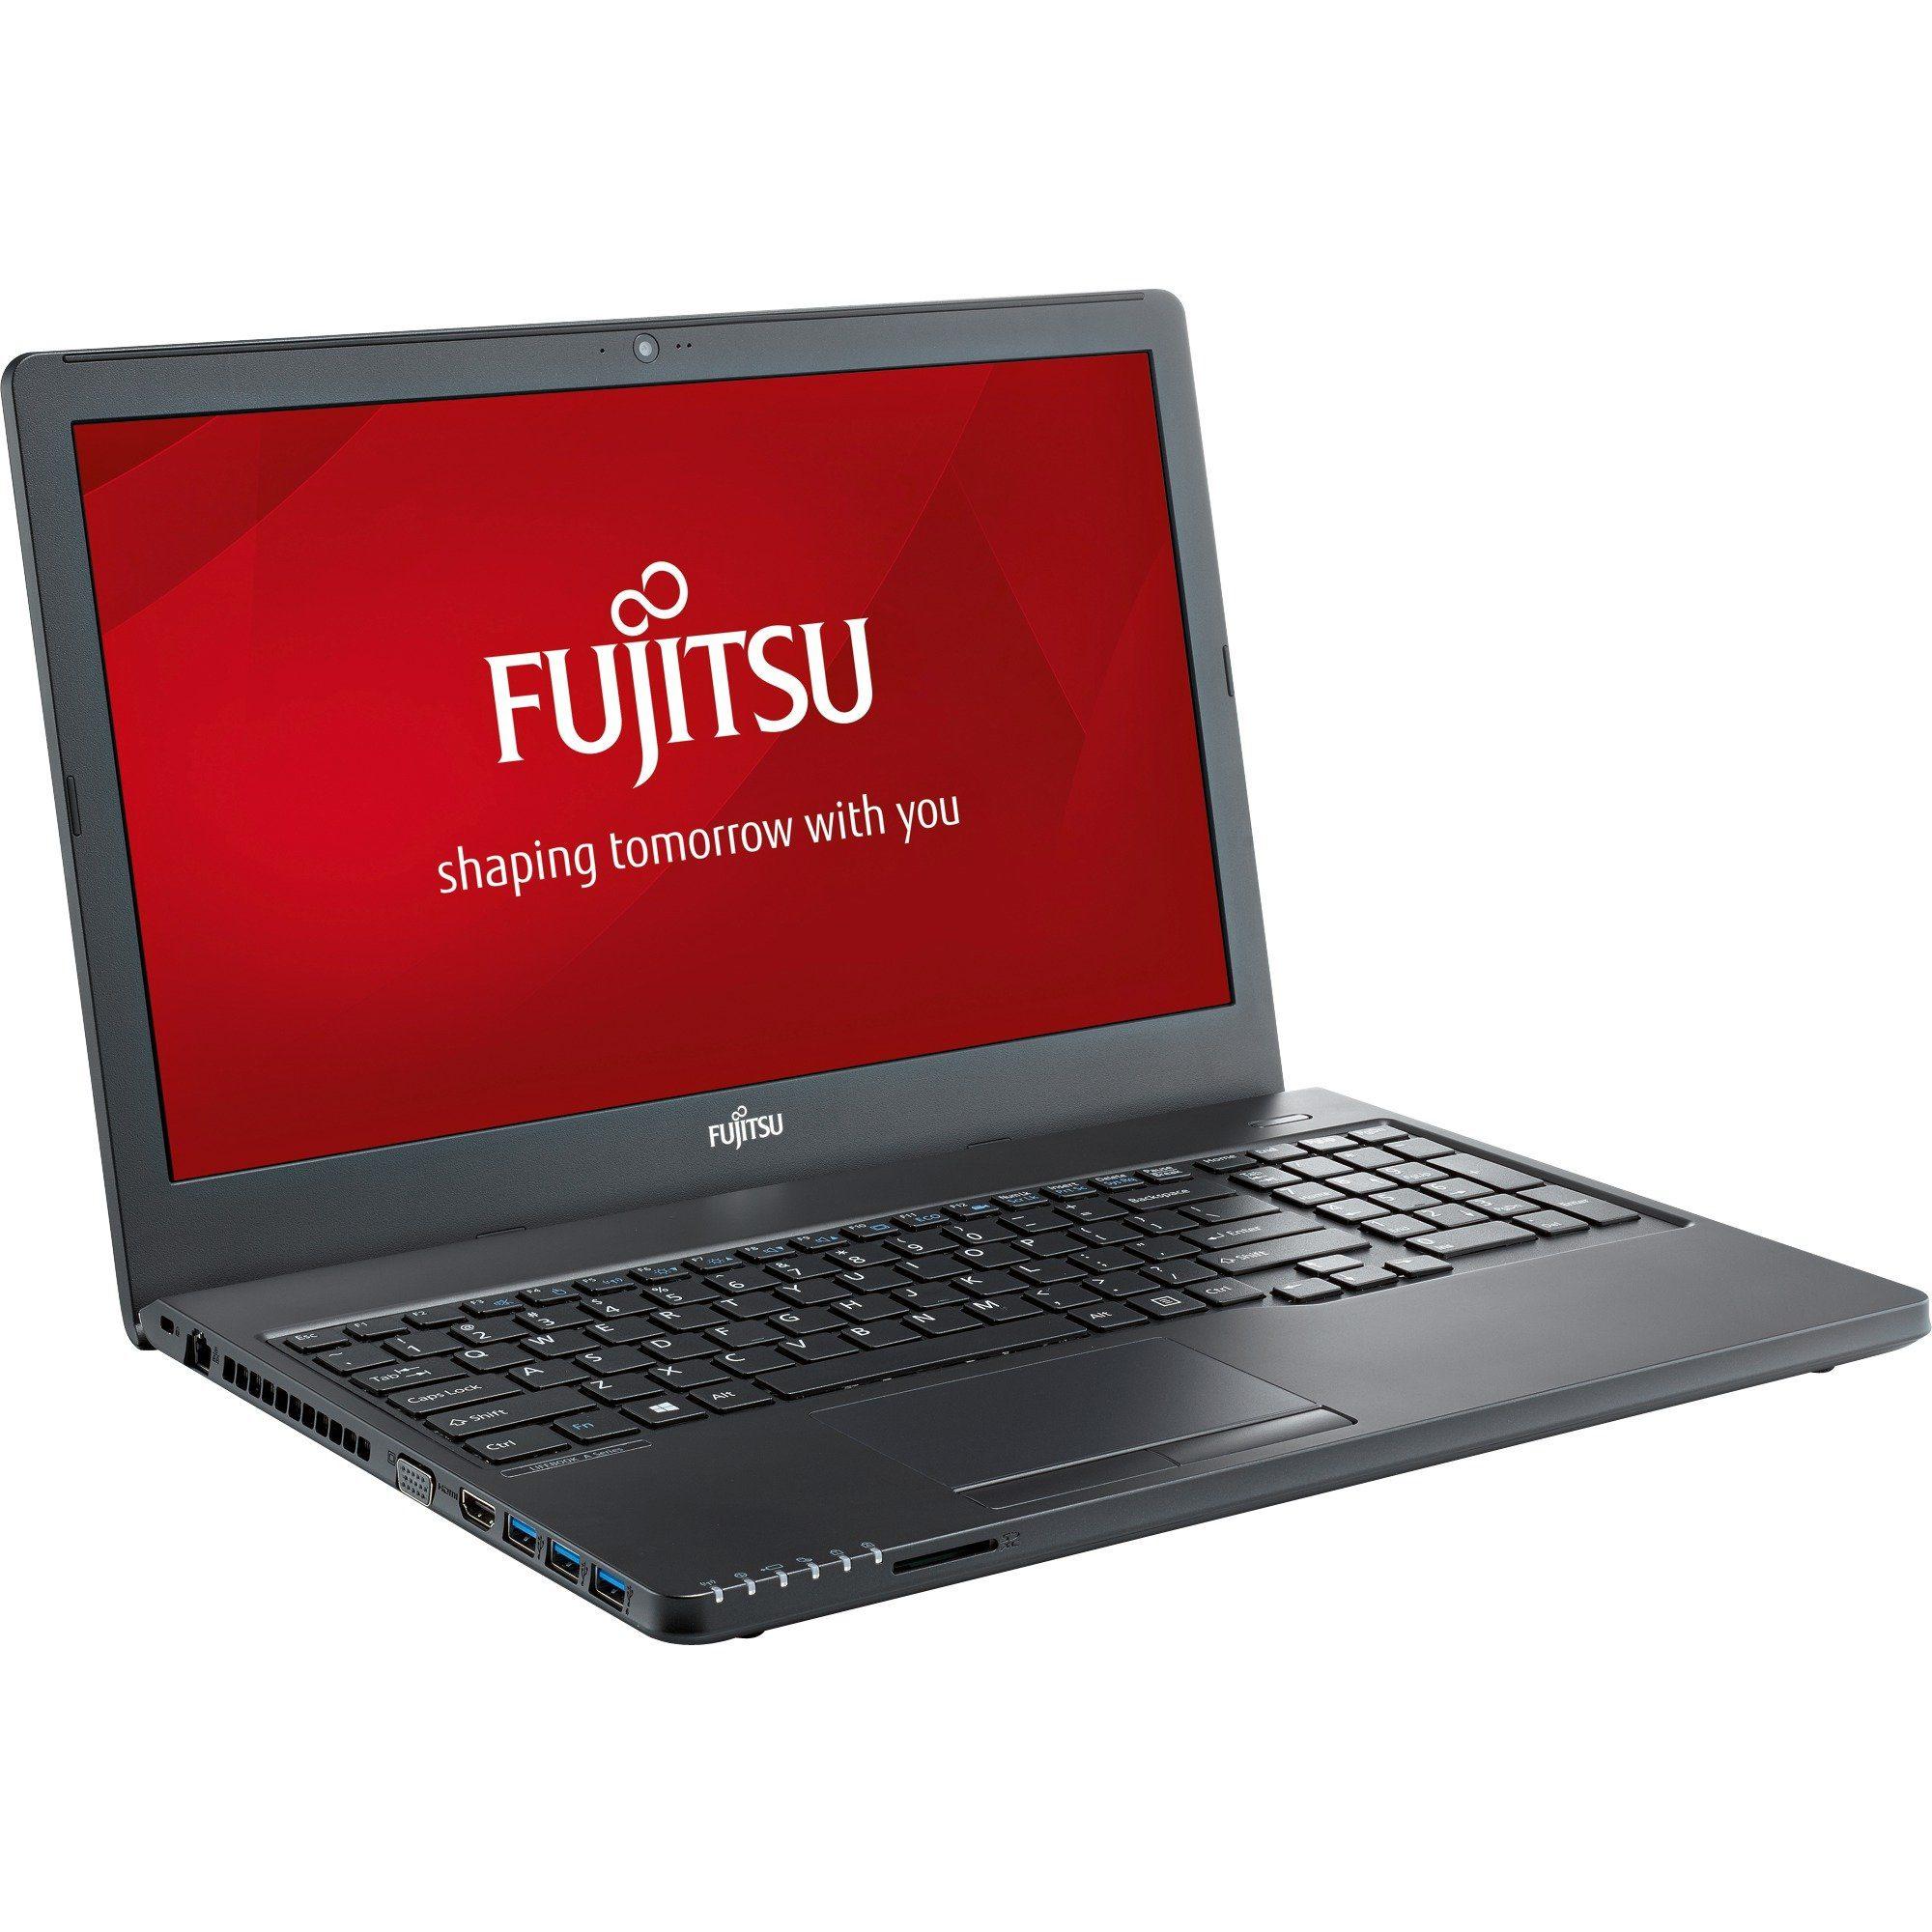 Fujitsu Notebook »LIFEBOOK A555 (VFY:A5550M83A5DE)«